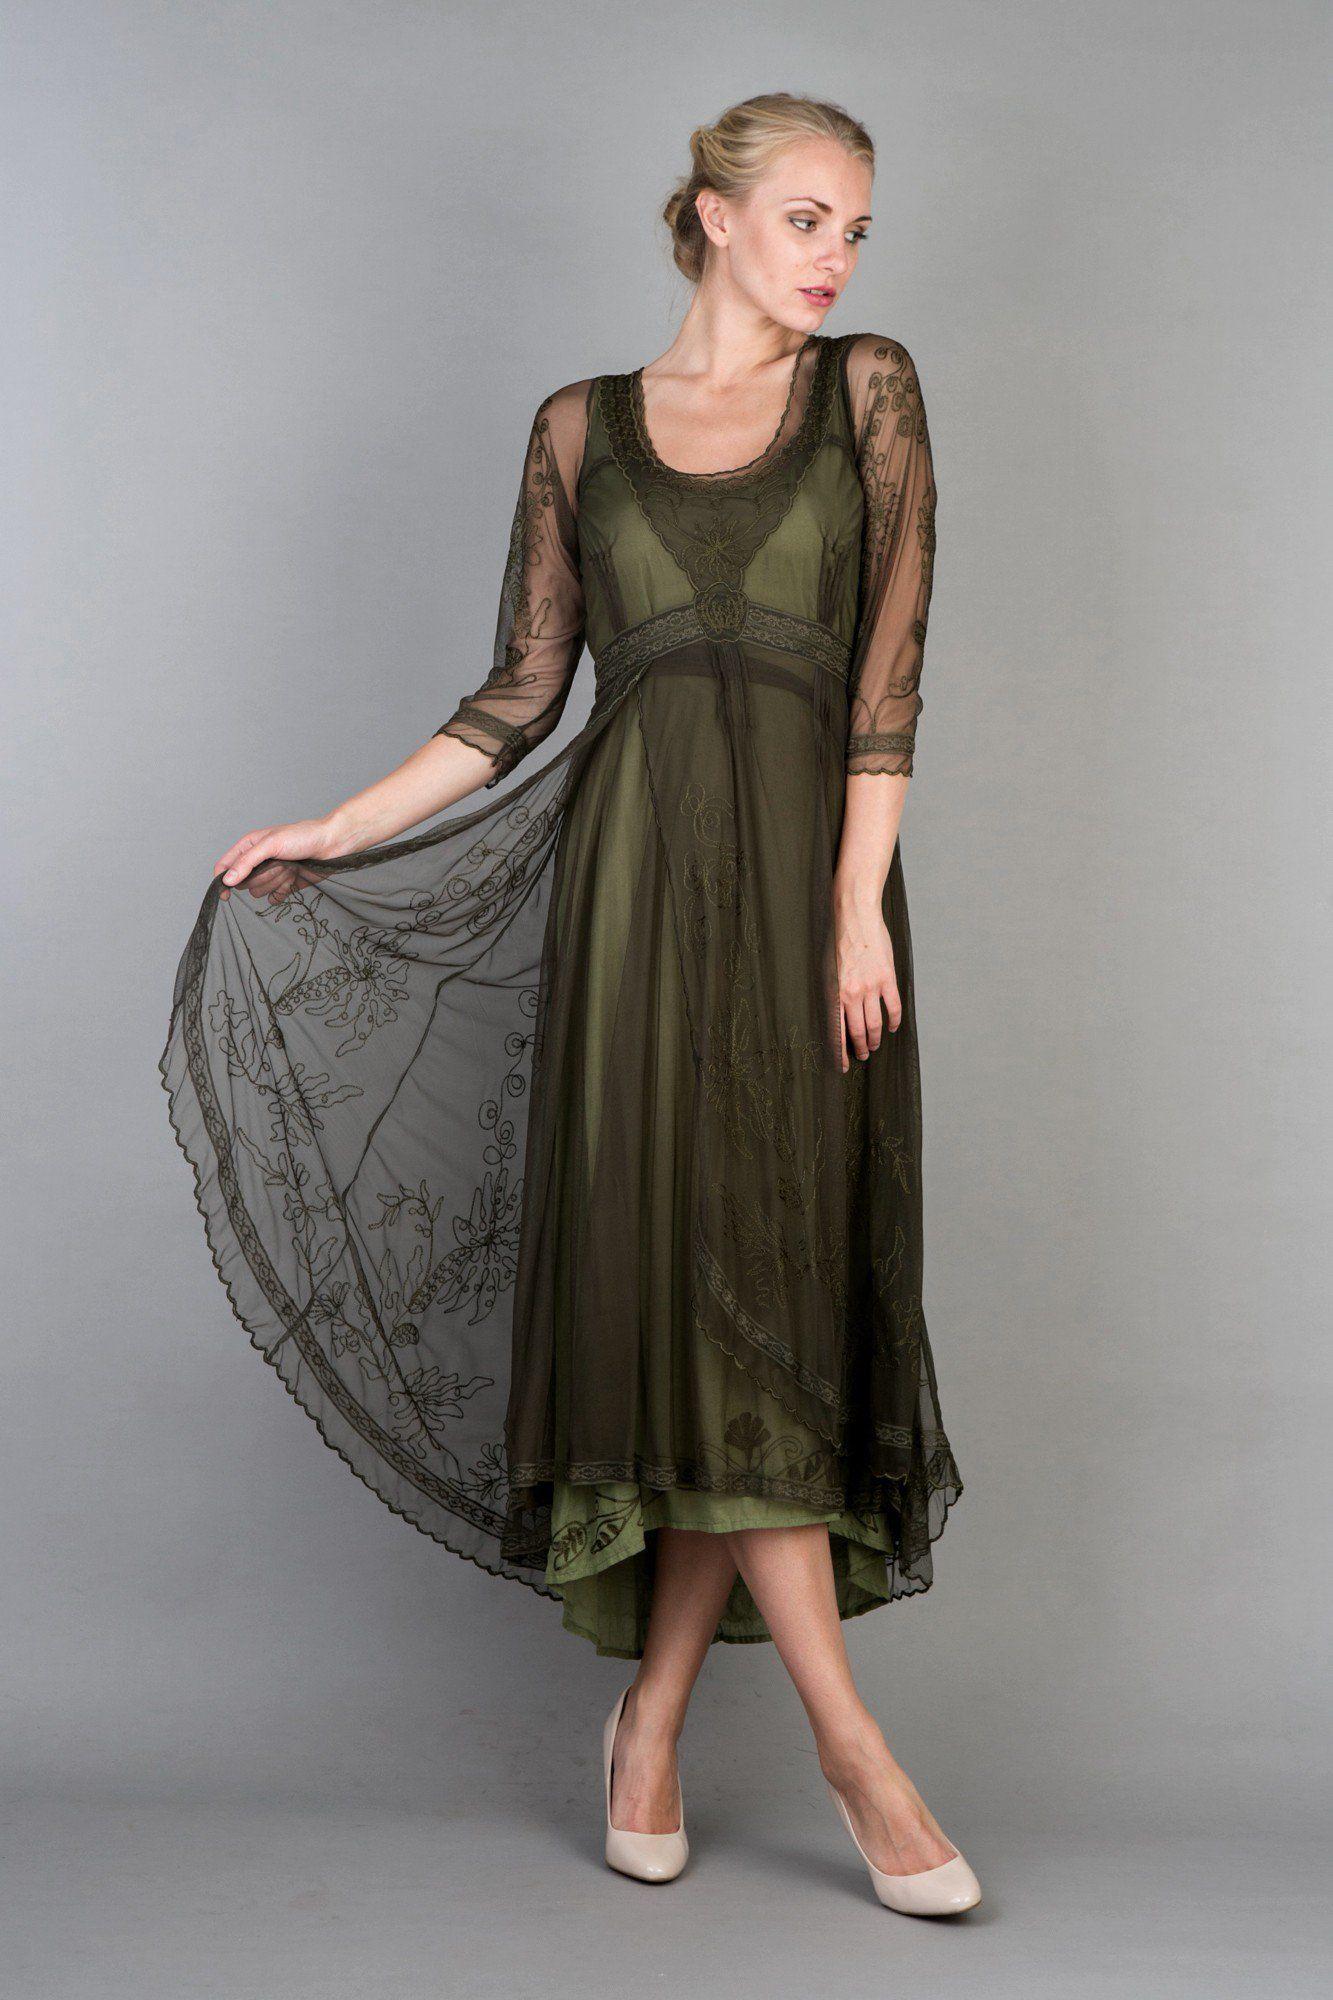 1930s Evening Dress, Art Deco Gown, Party Dress